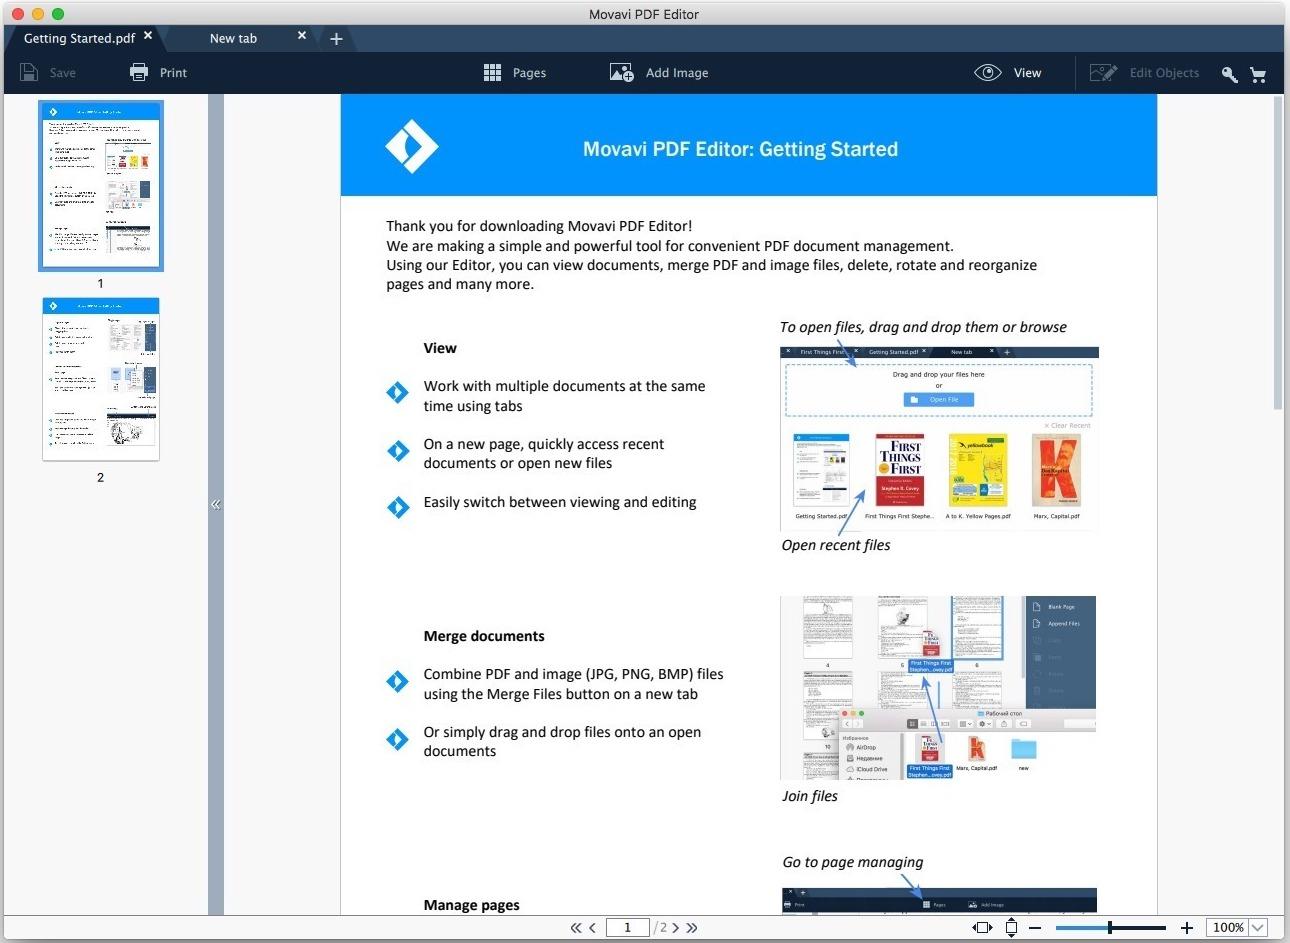 Movavi PDF Editor 1.7.1 – 快捷简易的 PDF 浏览和编辑工具